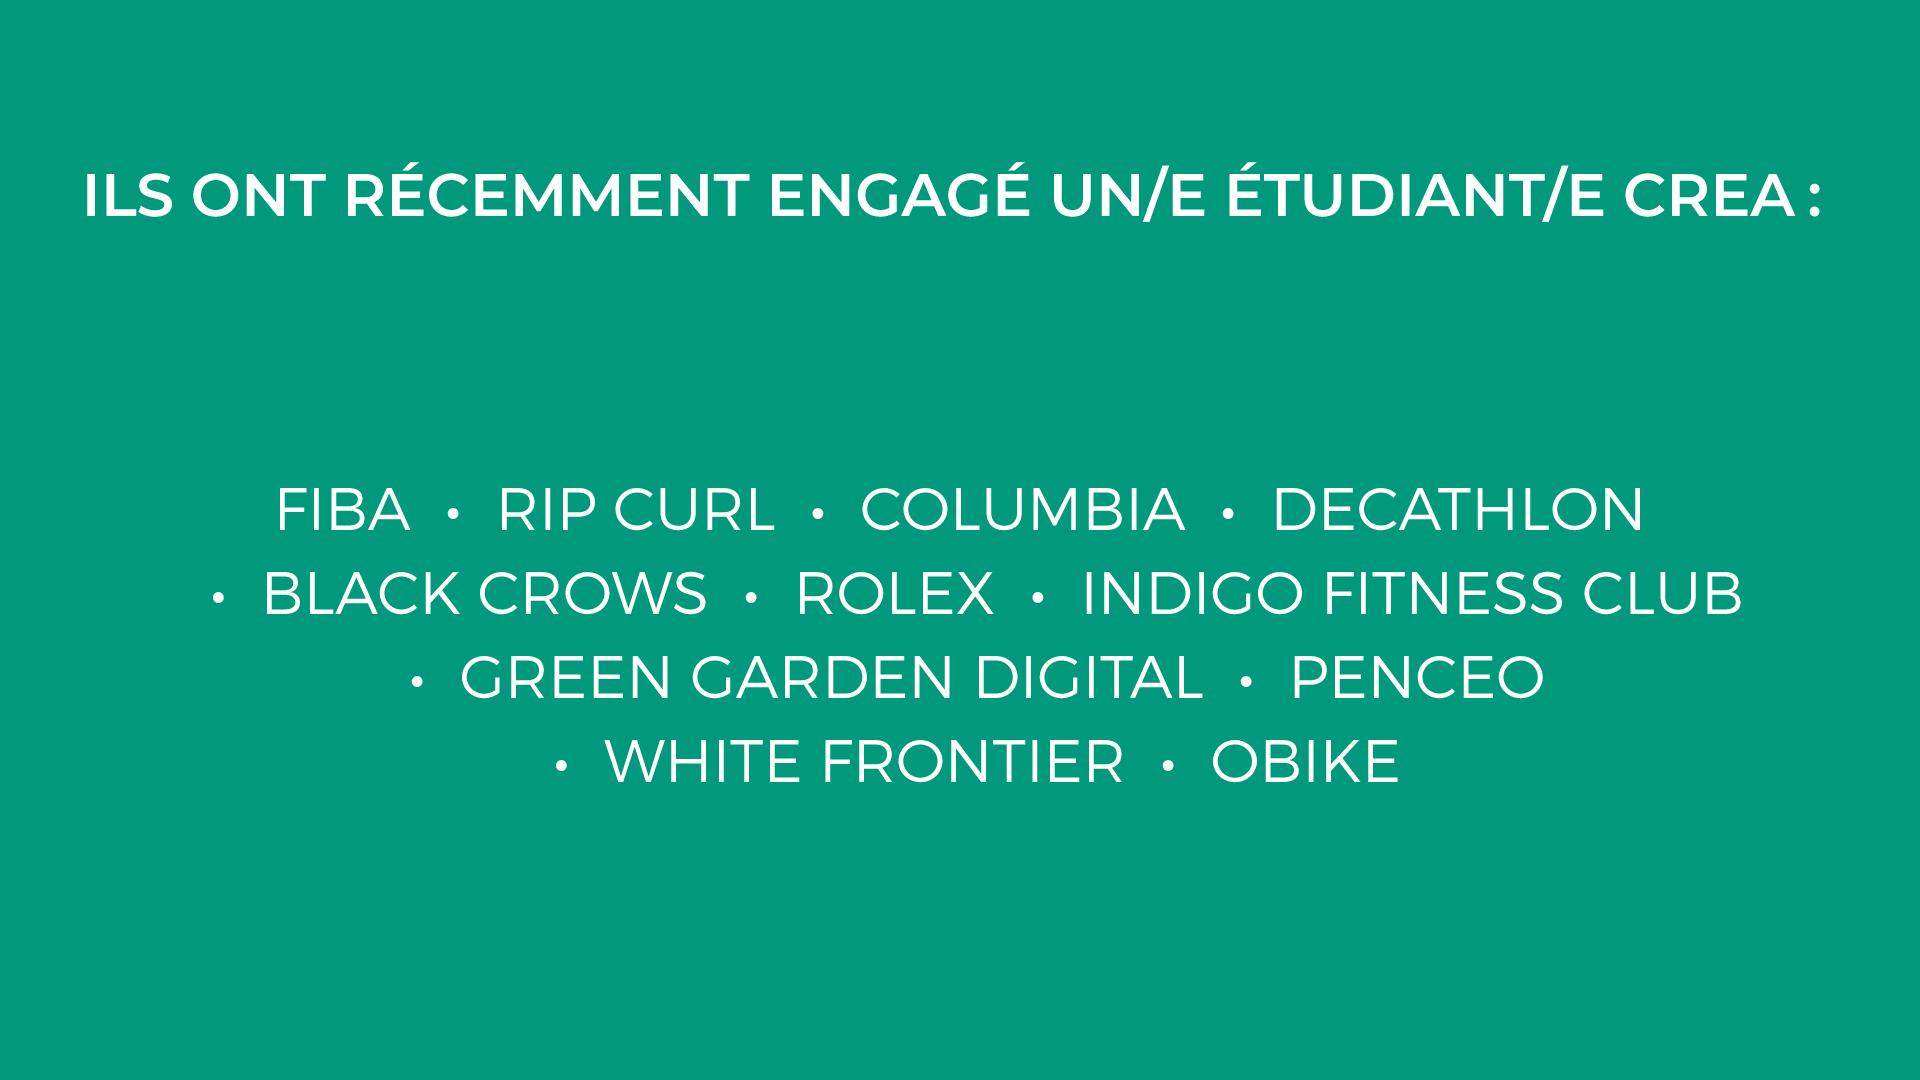 Sport_engagements